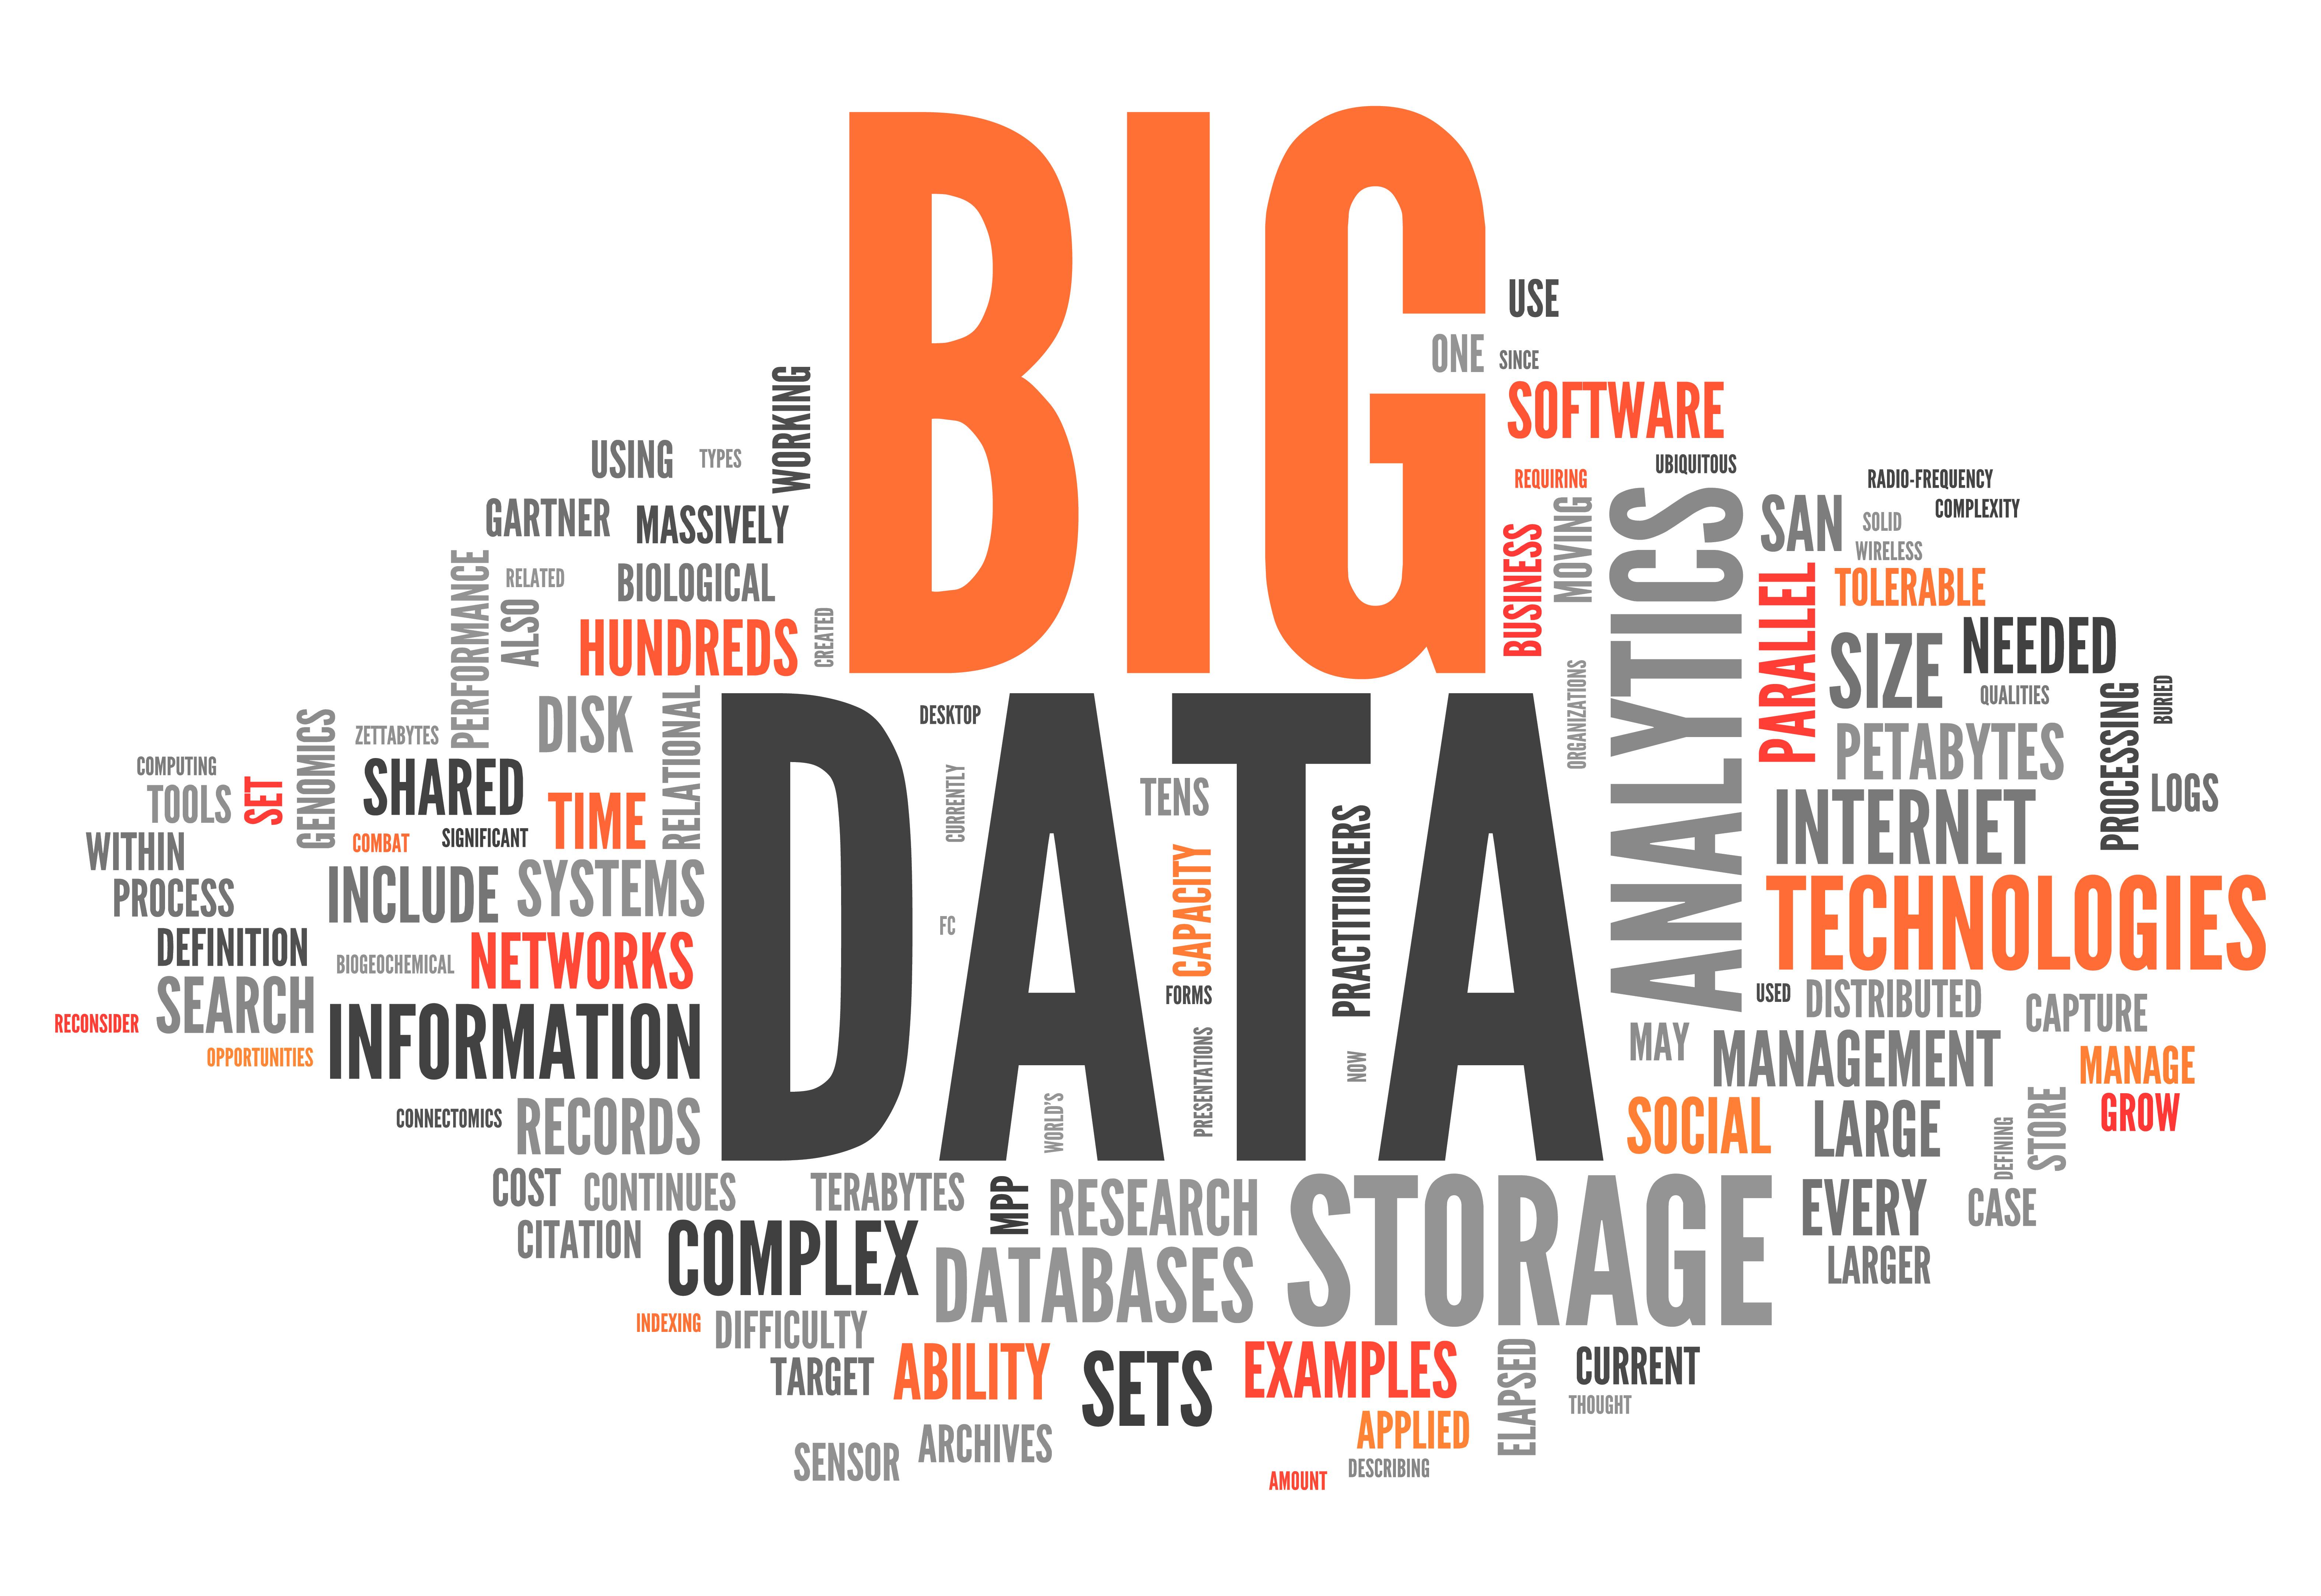 Аналитики рассказали о развитии Big Data до 2019 года